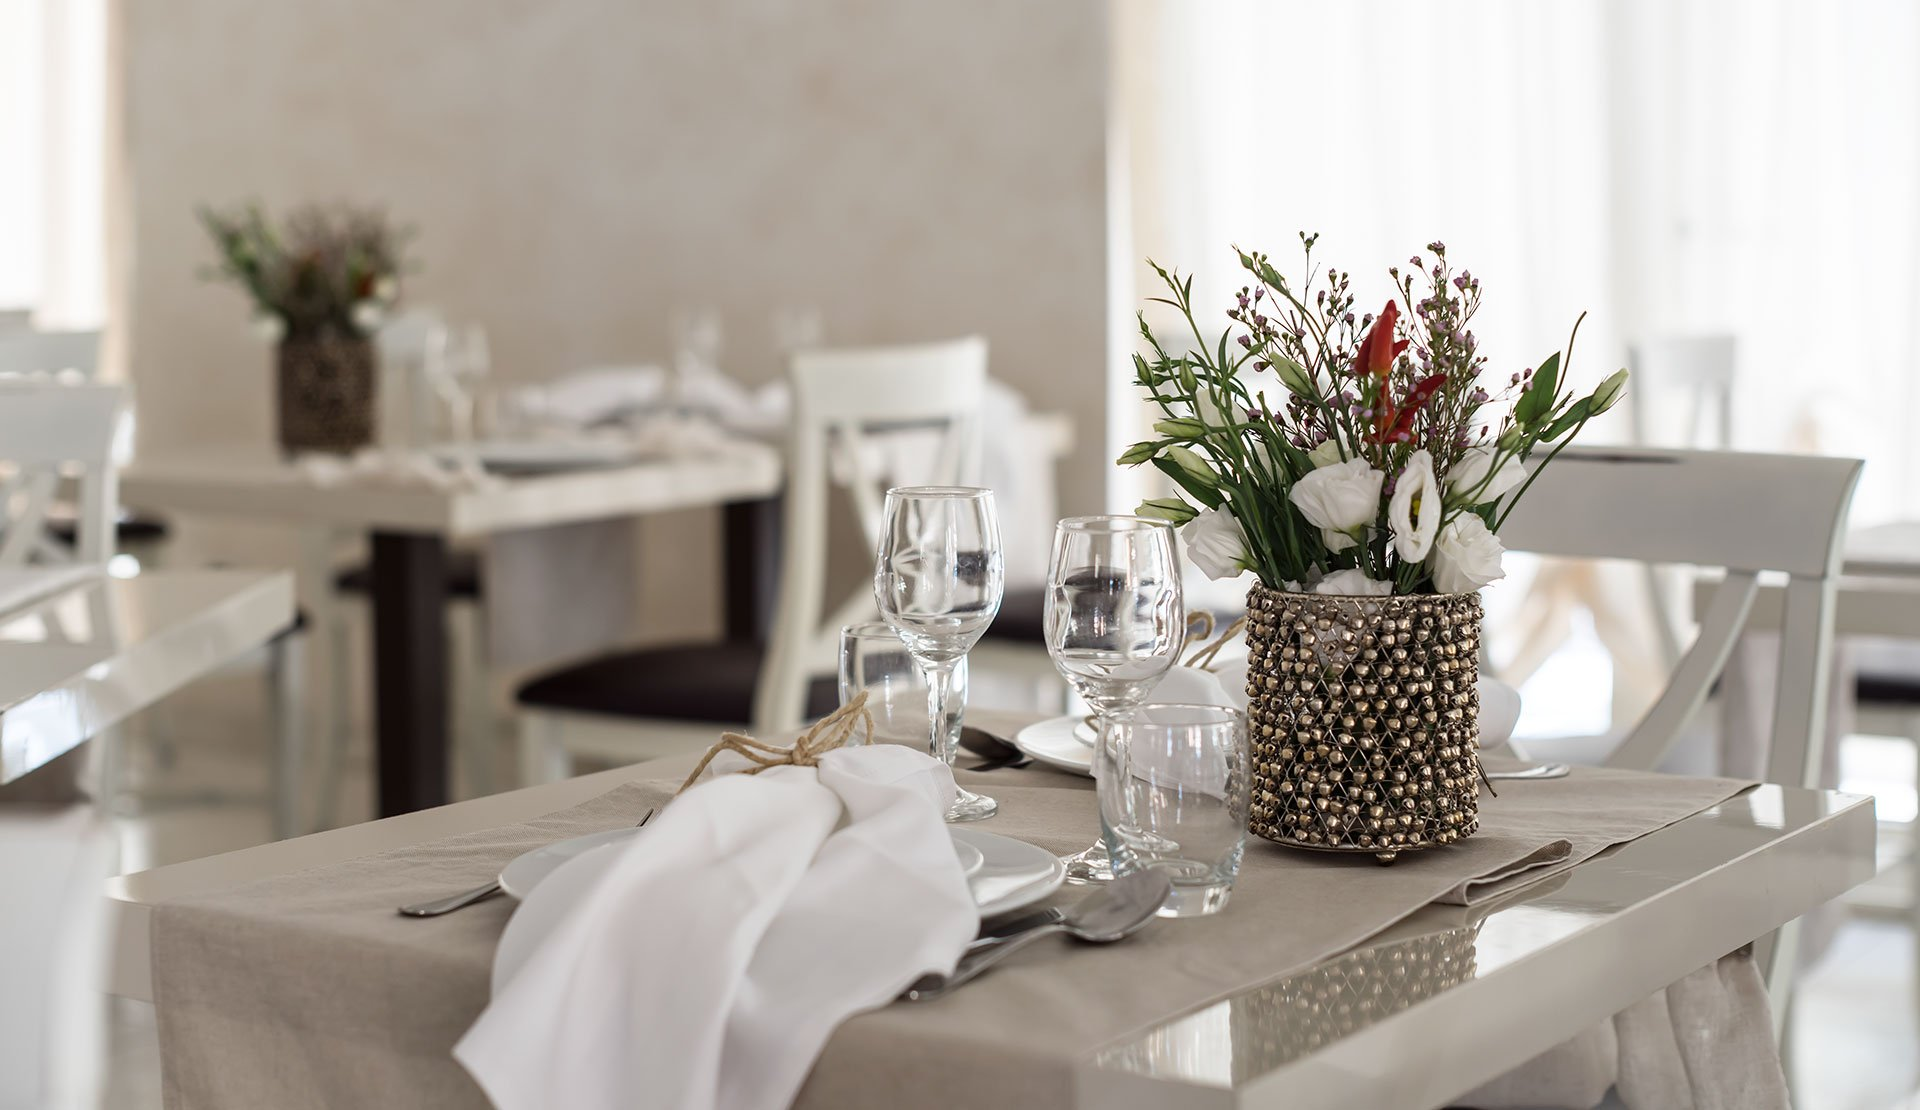 Hotel 3 stelle con piscina panoramica a misano adriatico - Hotel misano adriatico con piscina ...